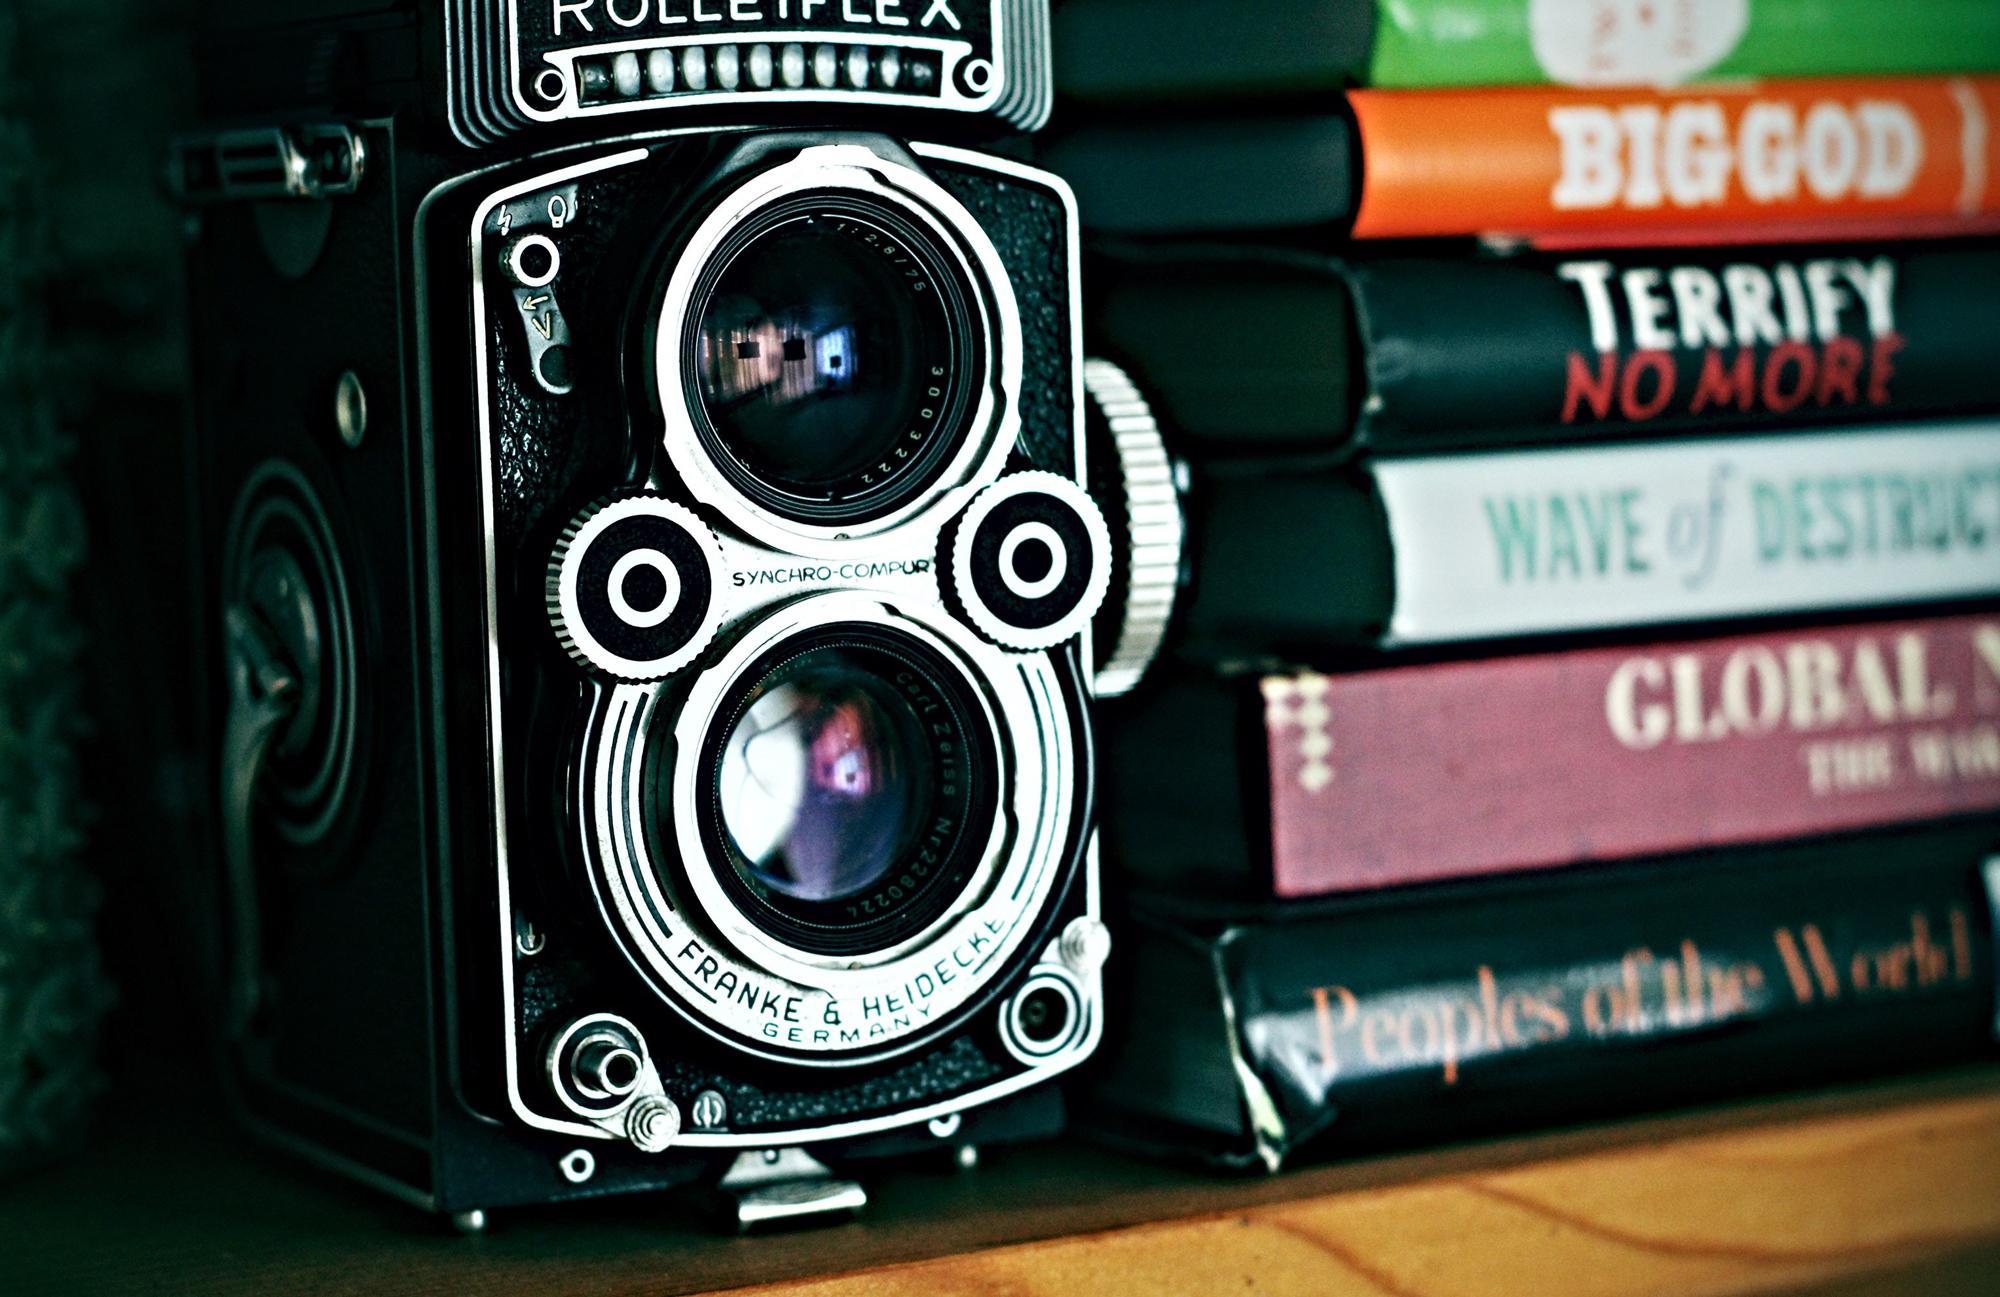 Rolleiflex and books (Pic: Calvin Hanson/Pexels)